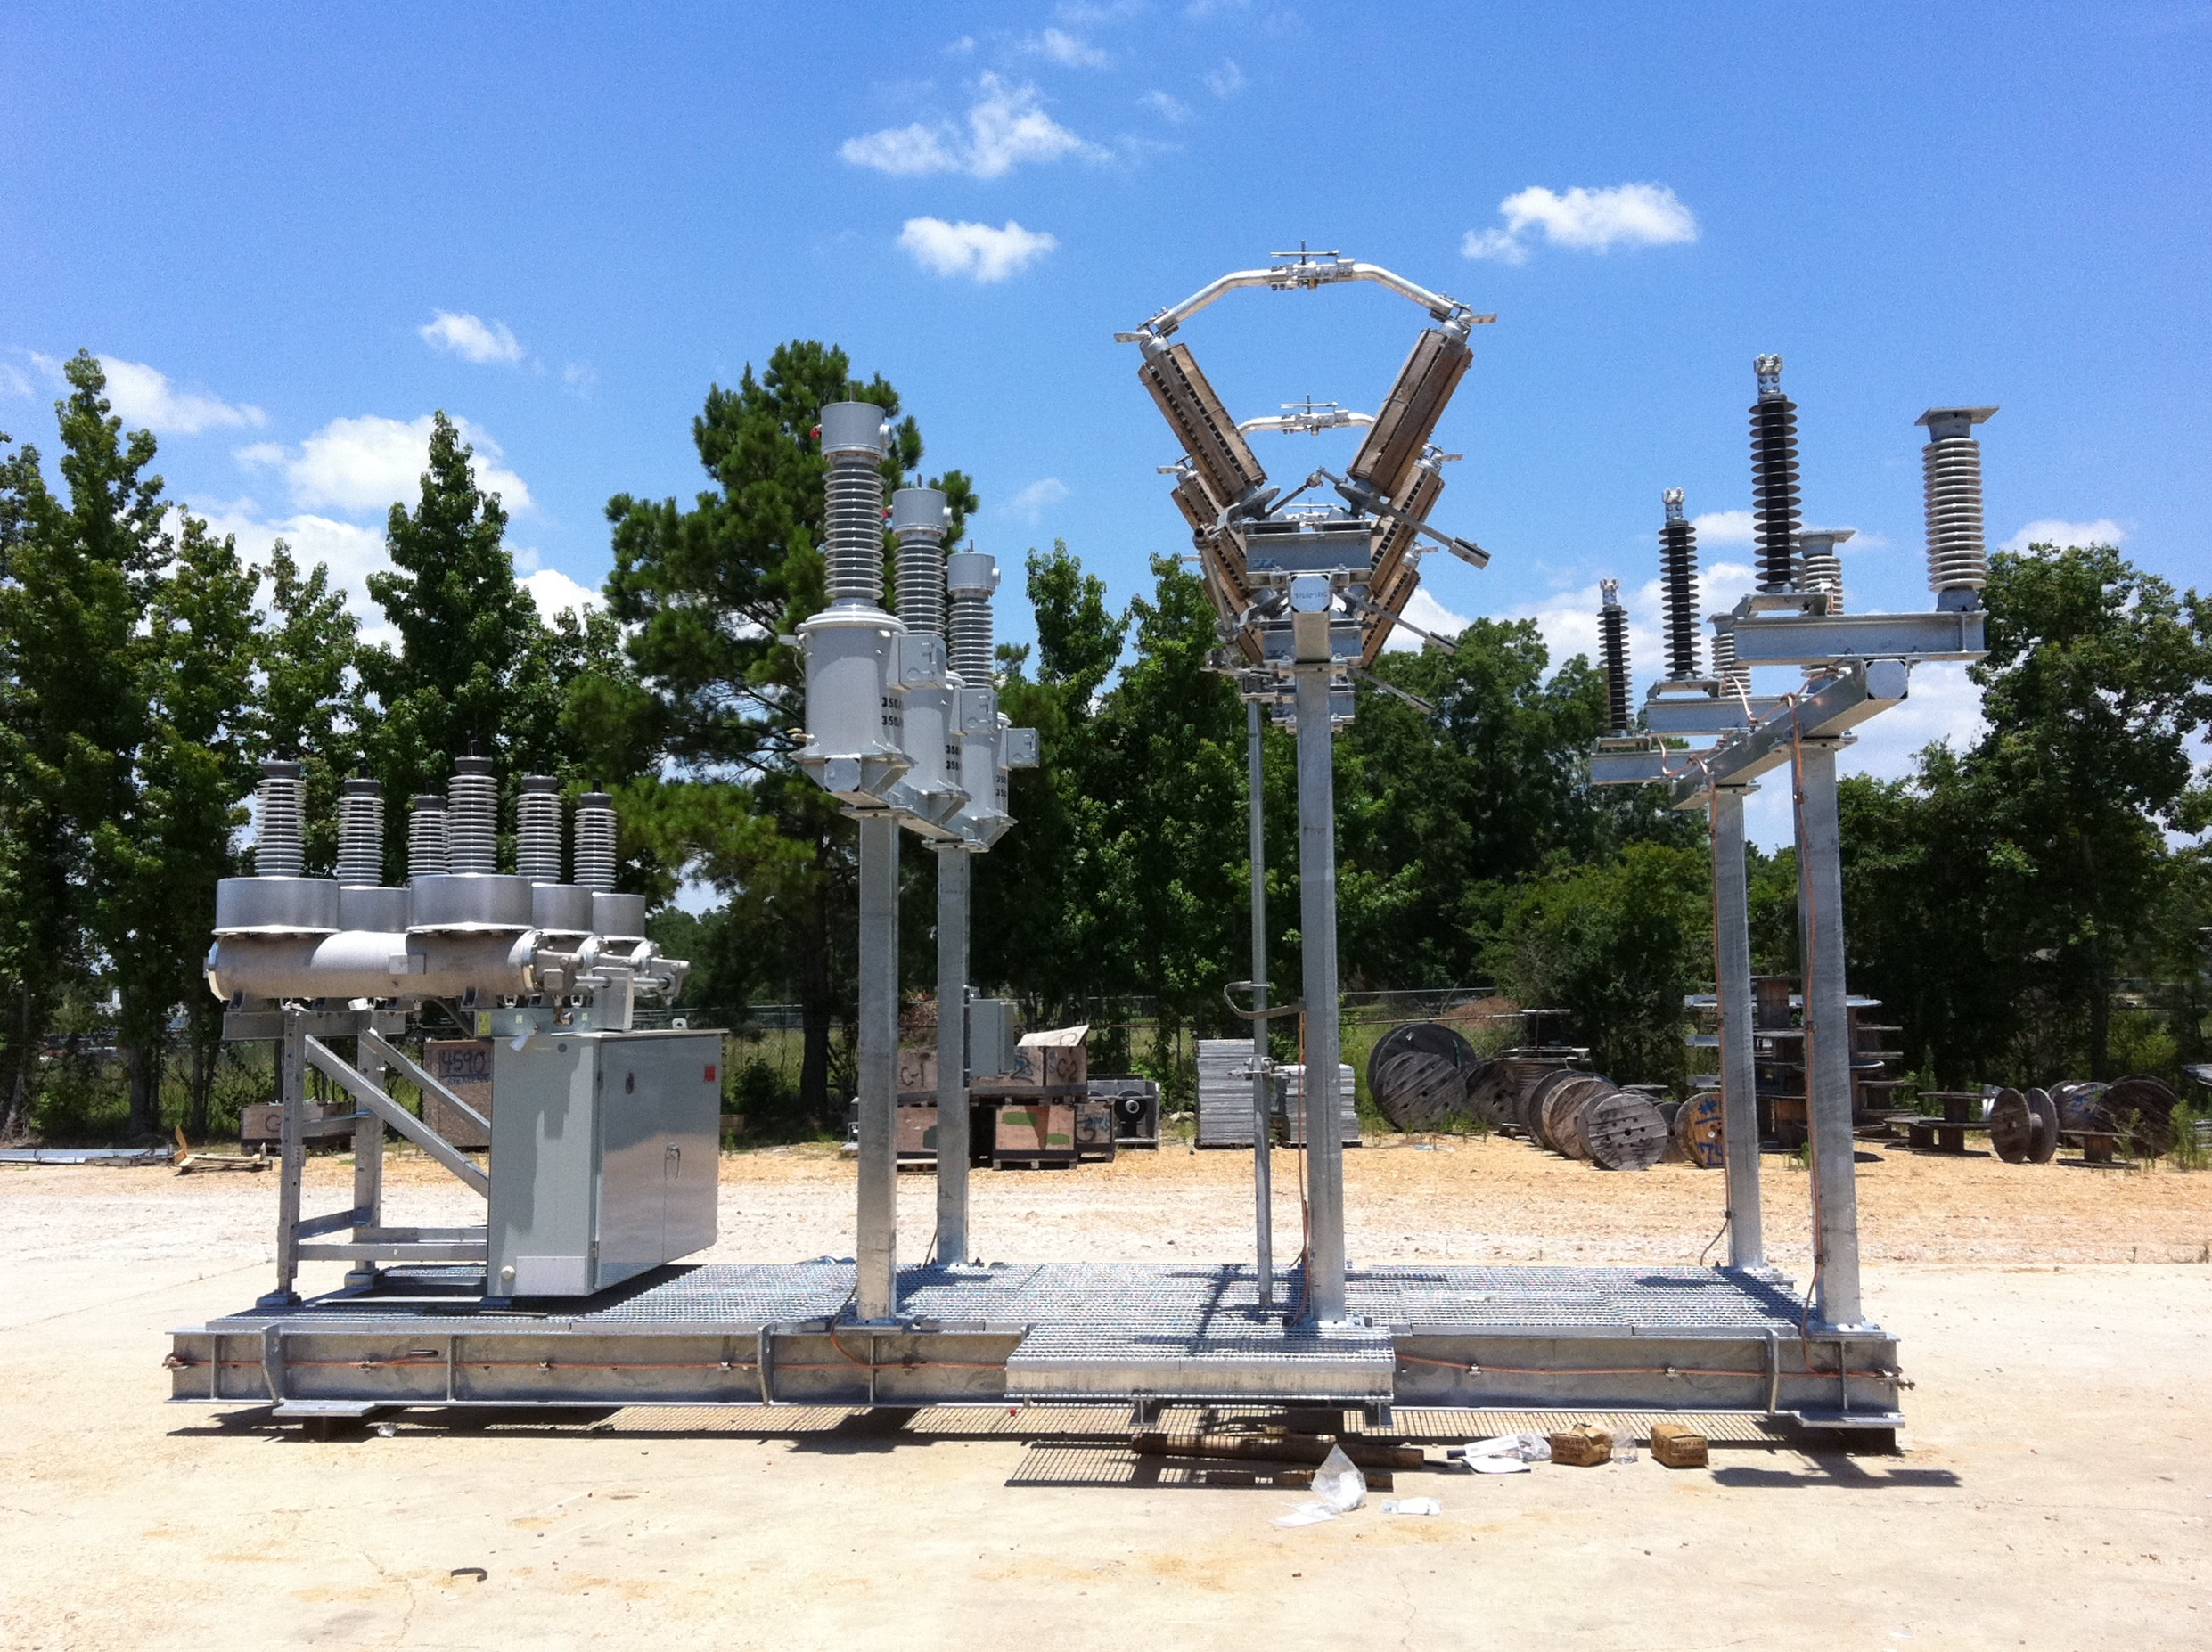 High Voltage Distribution